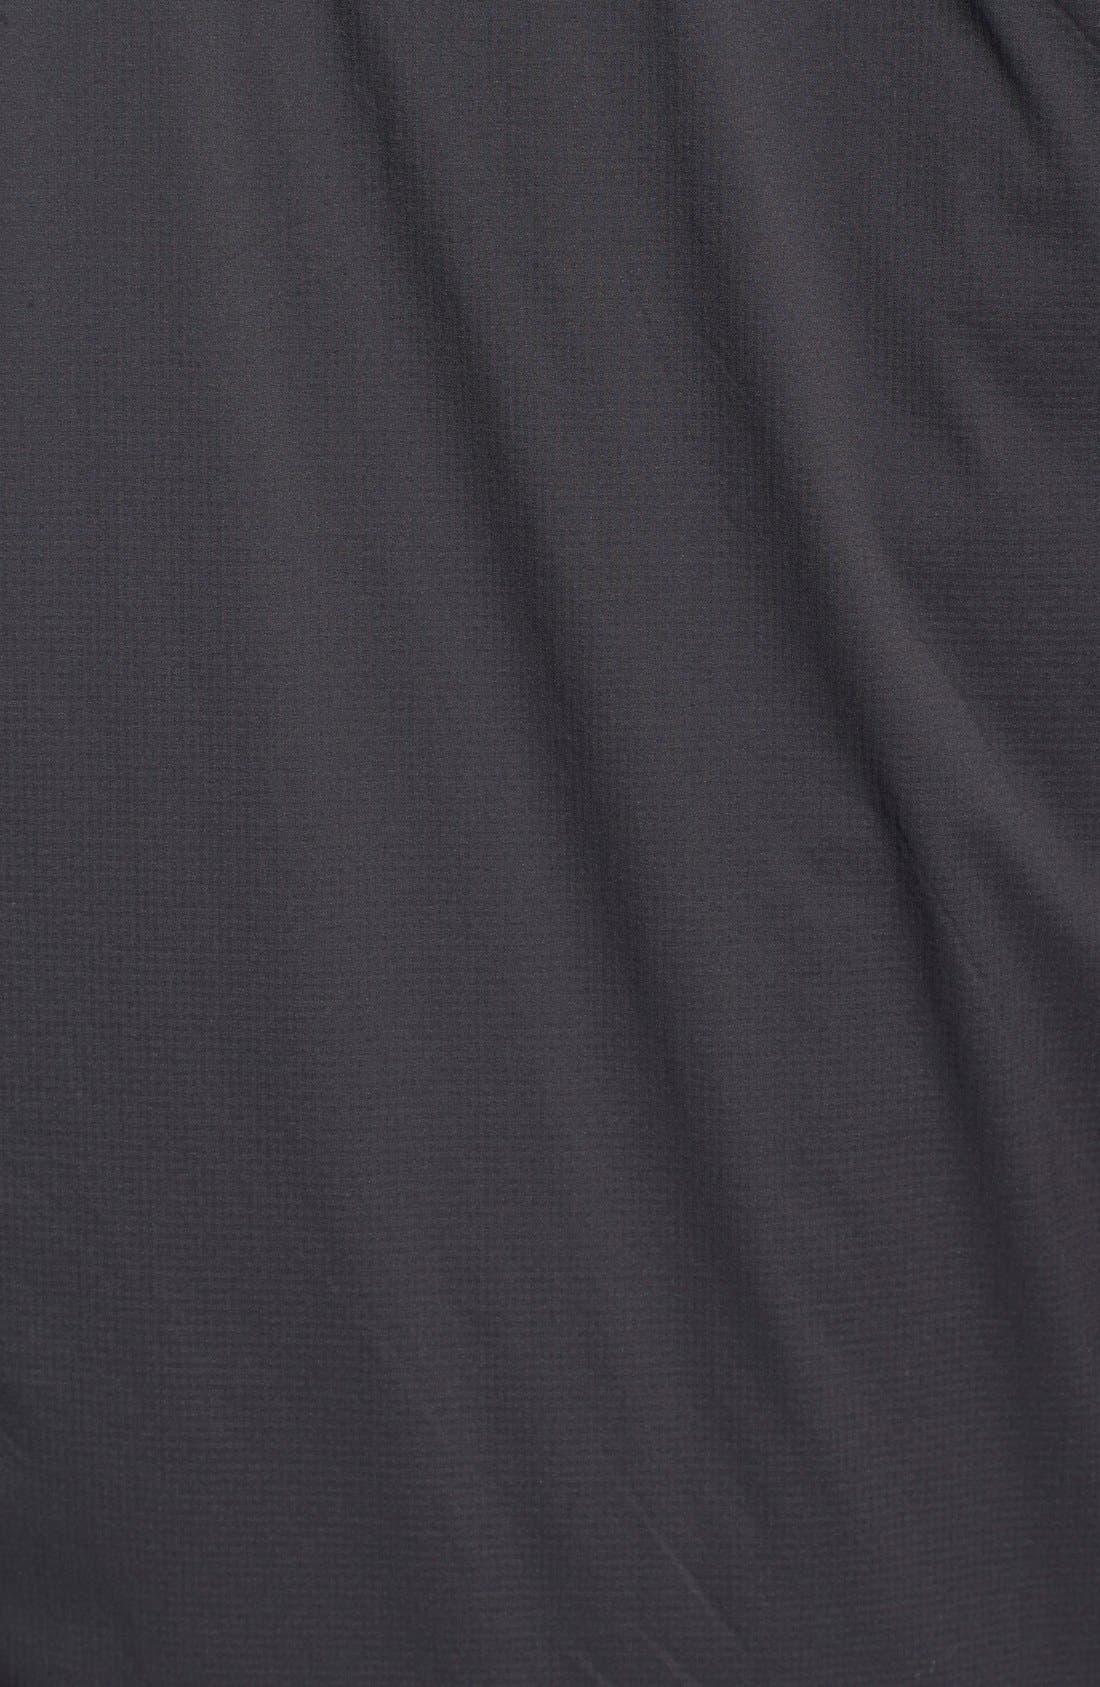 'Atom LT' Trim Fit Wind & Water Resistant Coreloft<sup>™</sup> Hooded Jacket,                             Alternate thumbnail 2, color,                             001